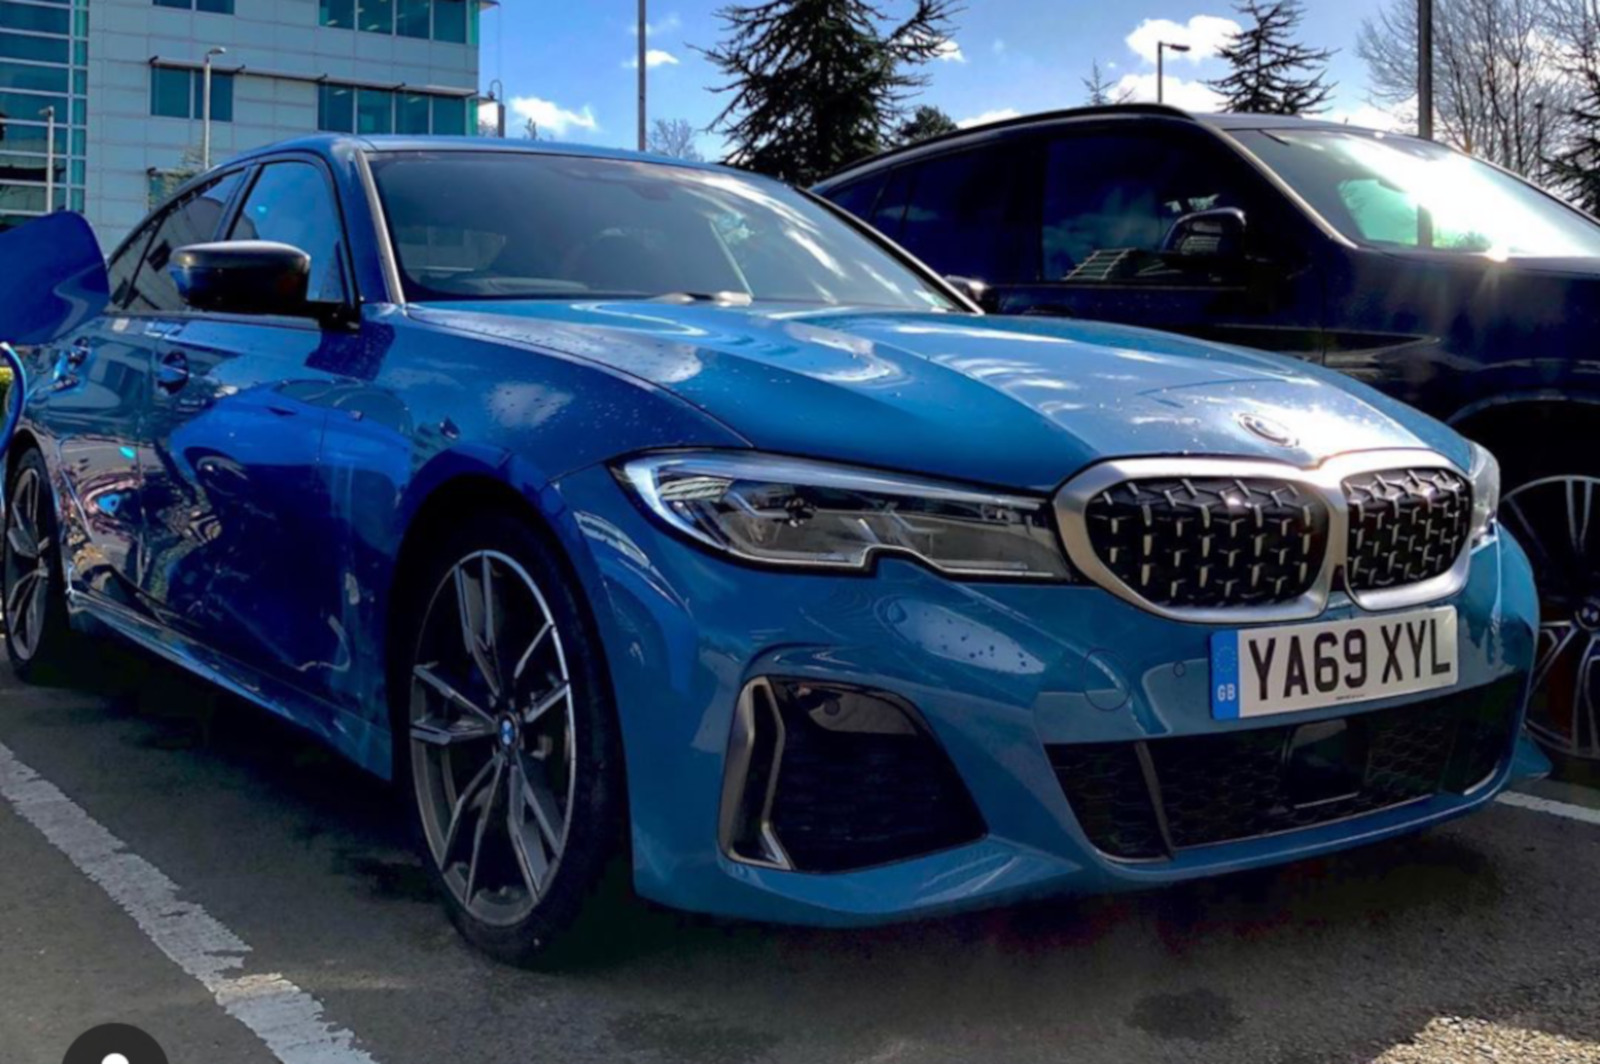 2018 - [BMW] Série 3 [G20/G21] - Page 35 2020-BMW-M340d-G20-Laguna-Seca-Blau-Individual-01